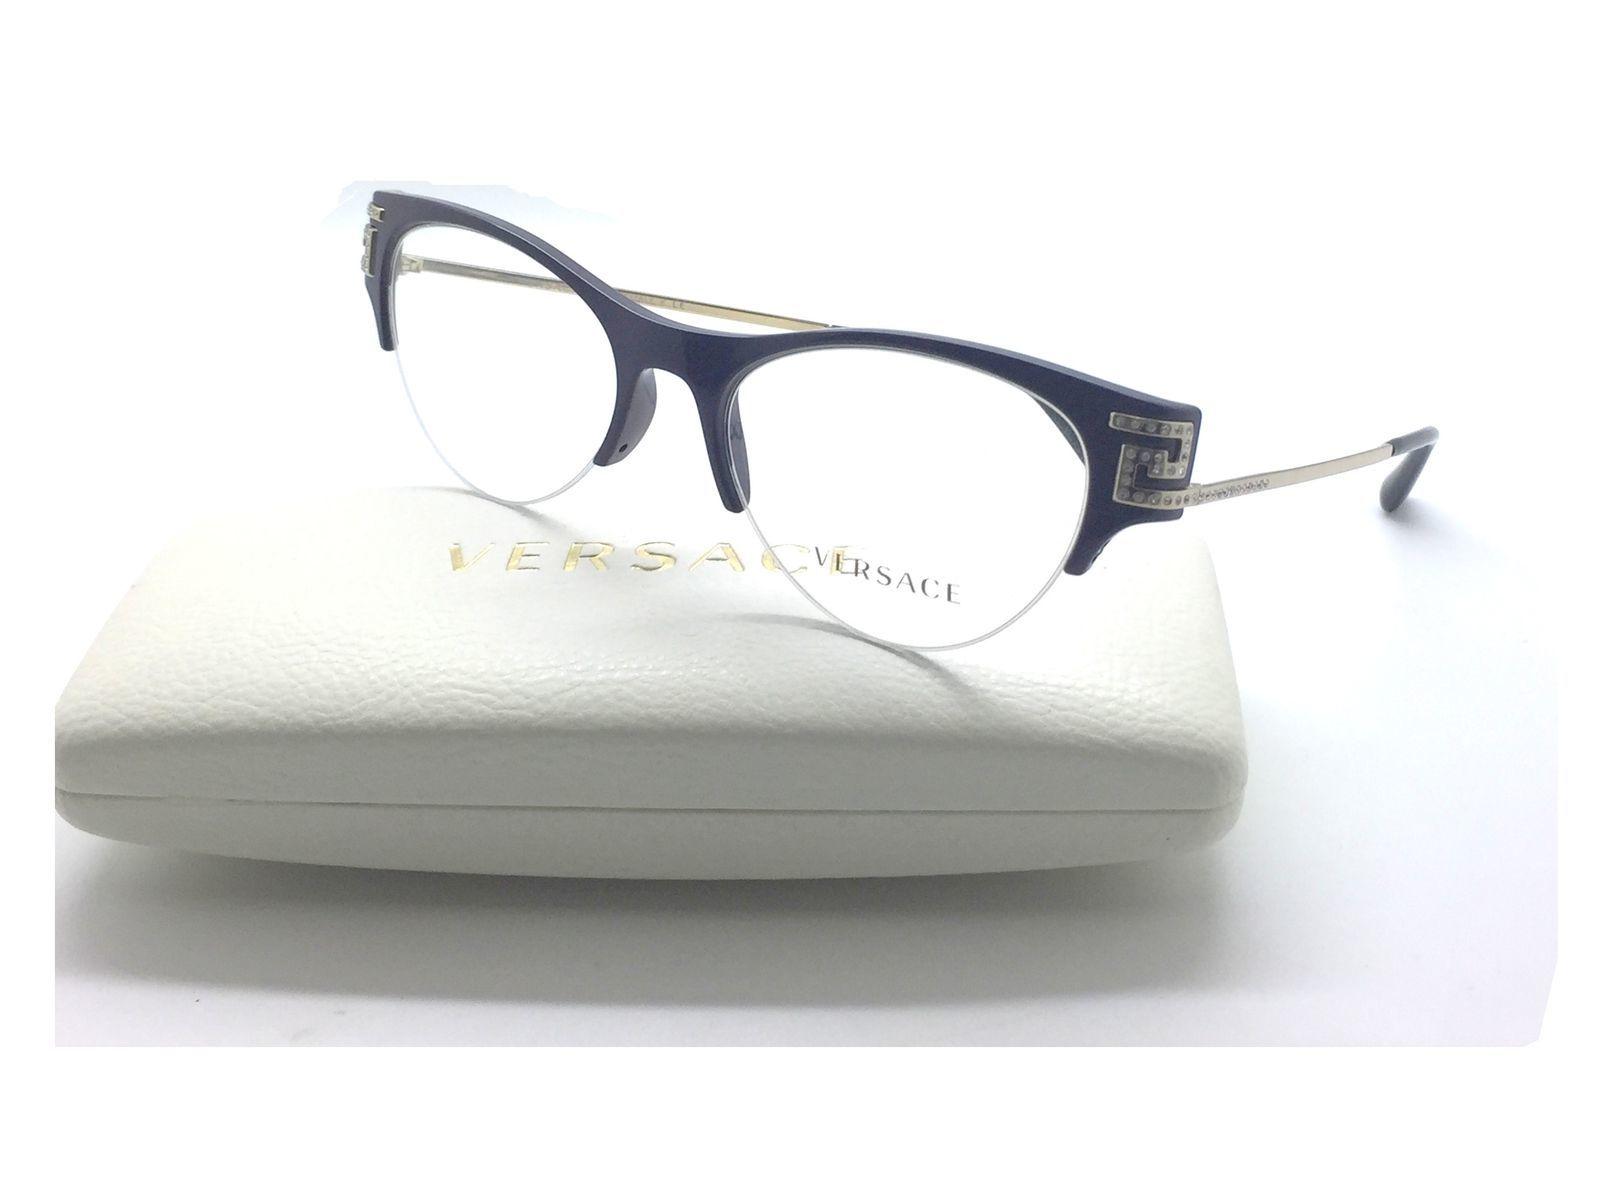 7ca529dd616e Versace MOD 3226-B 5185 eggplant eyeglasses and 50 similar items